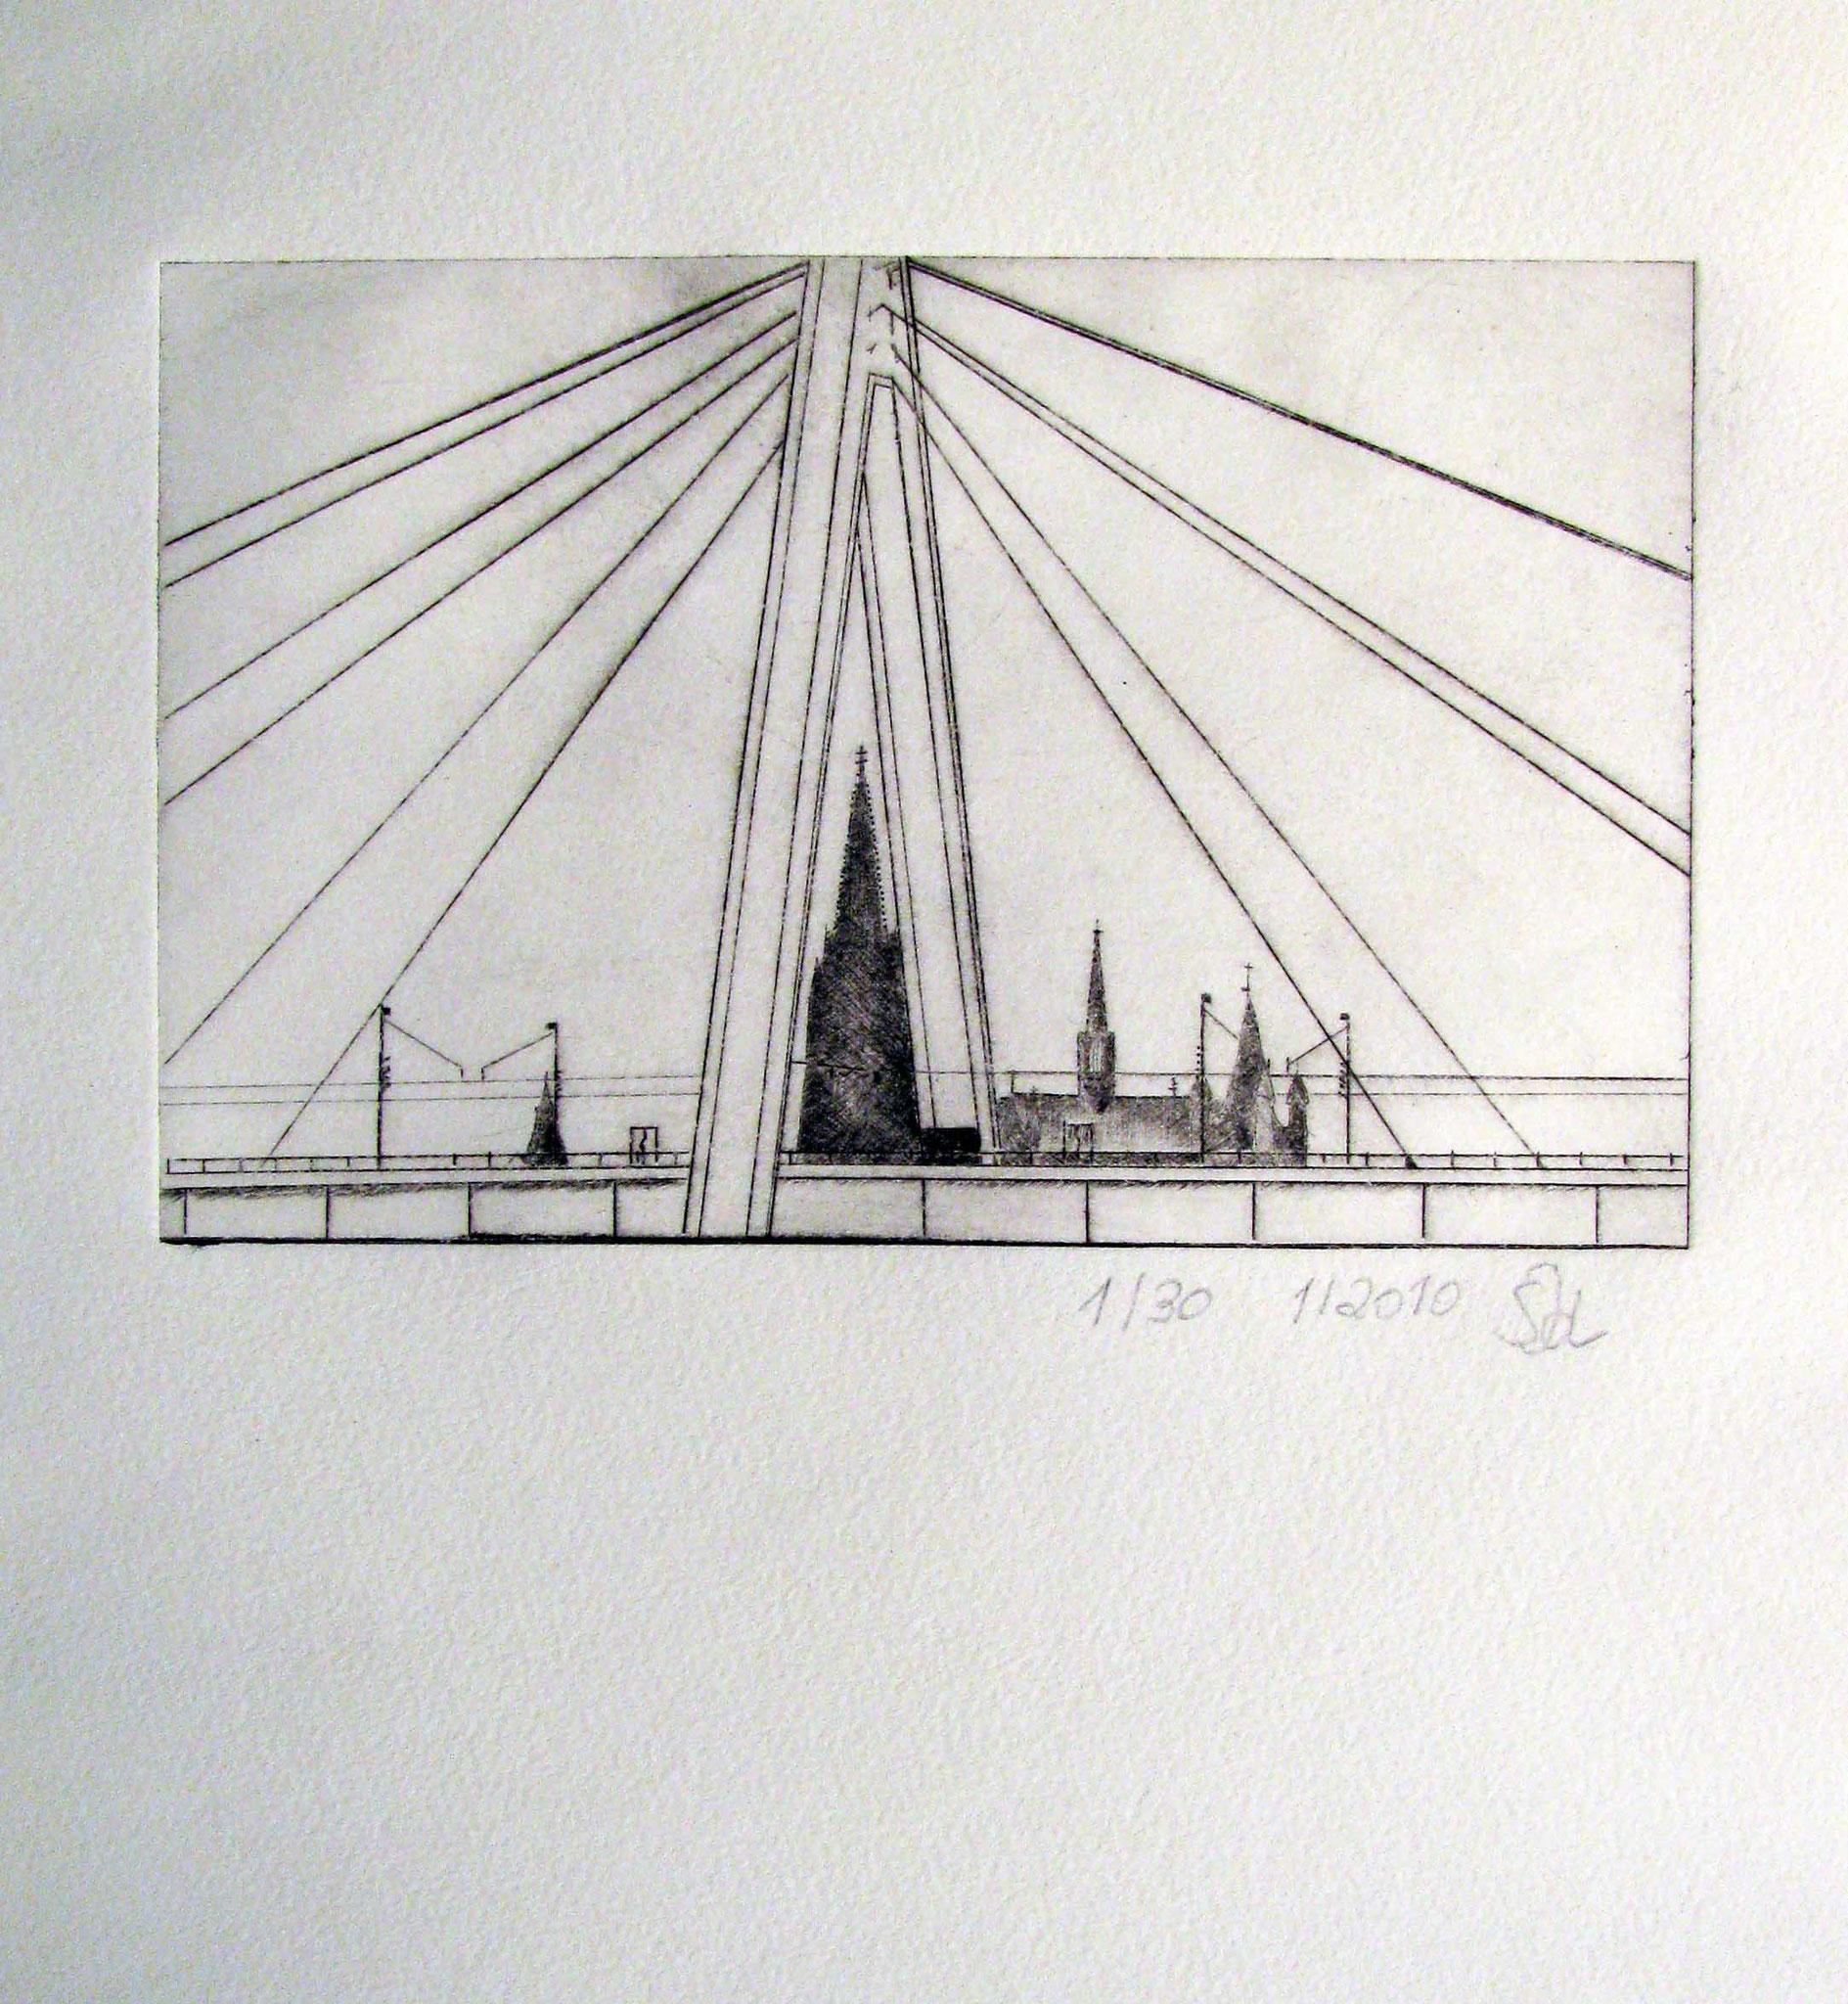 """Cologne"" - Kaltnadelradierung 2010 / 10 cm x 15 cm"